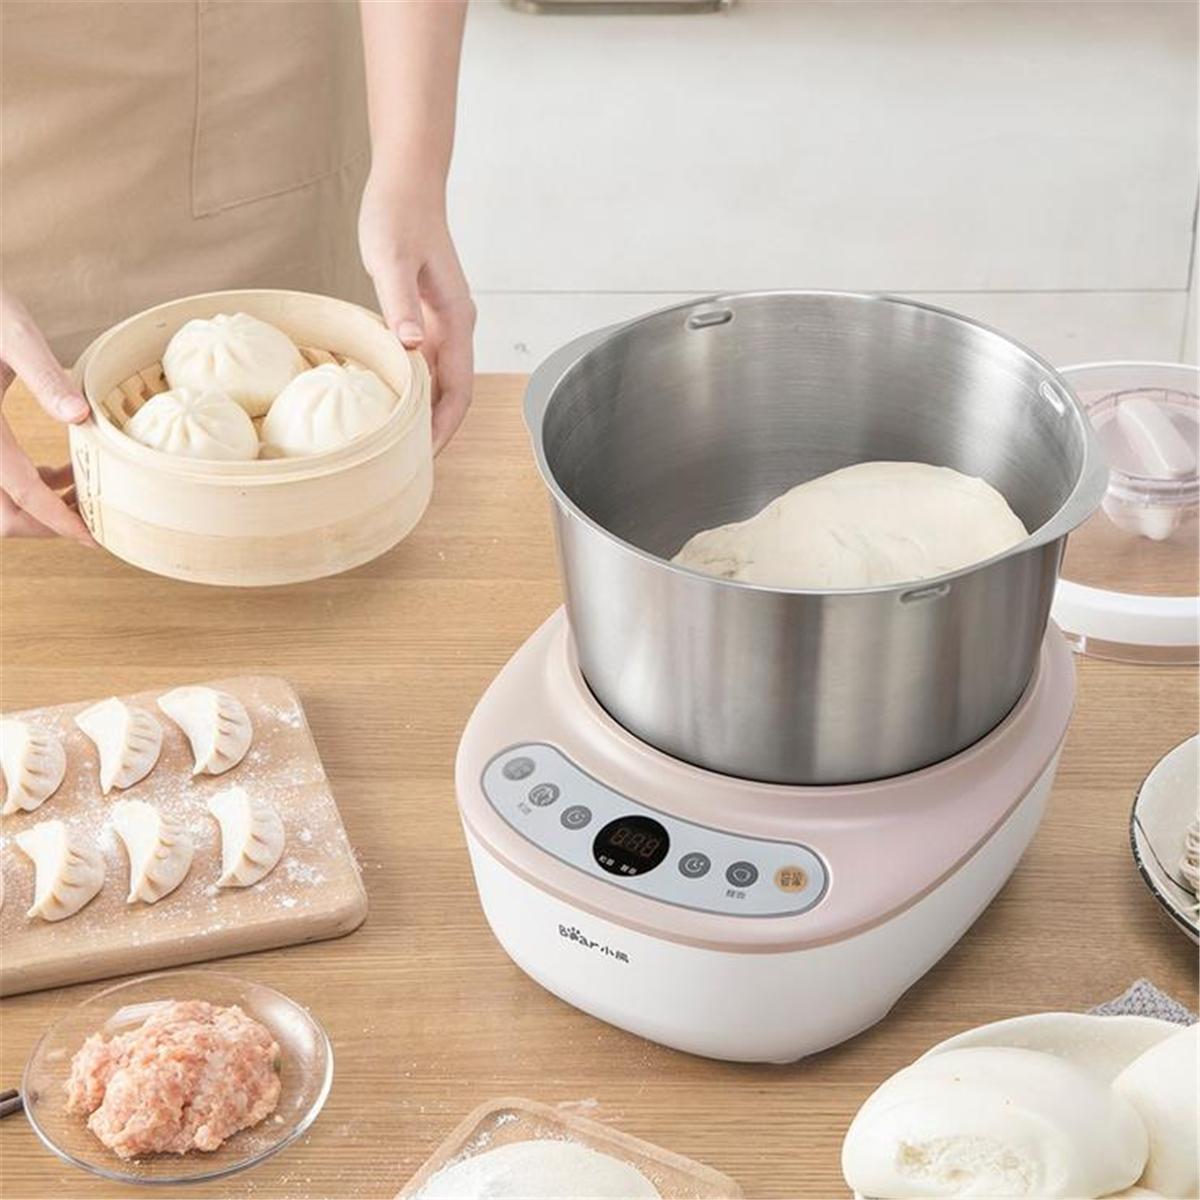 Bear HMJ-A50B1 Household Full-automatic Dough Maker Kneading Dough Fermentation Machine Blender